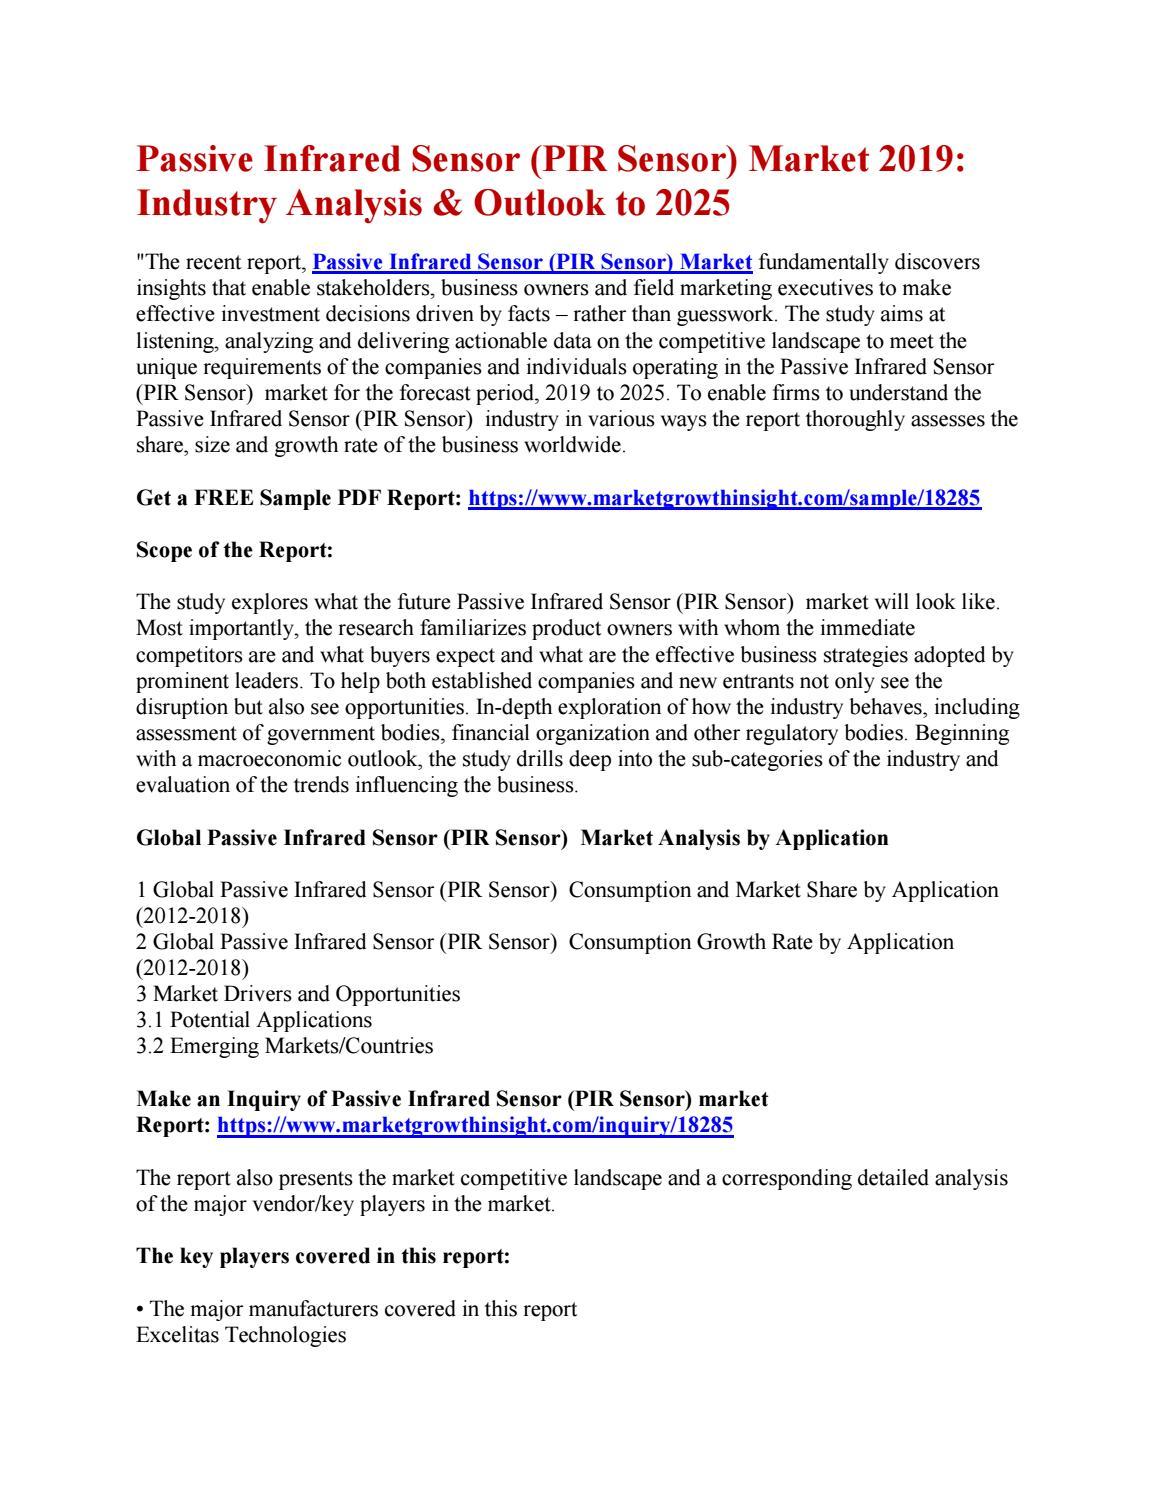 Passive Infrared Sensor (PIR Sensor) Market 2019: Industry